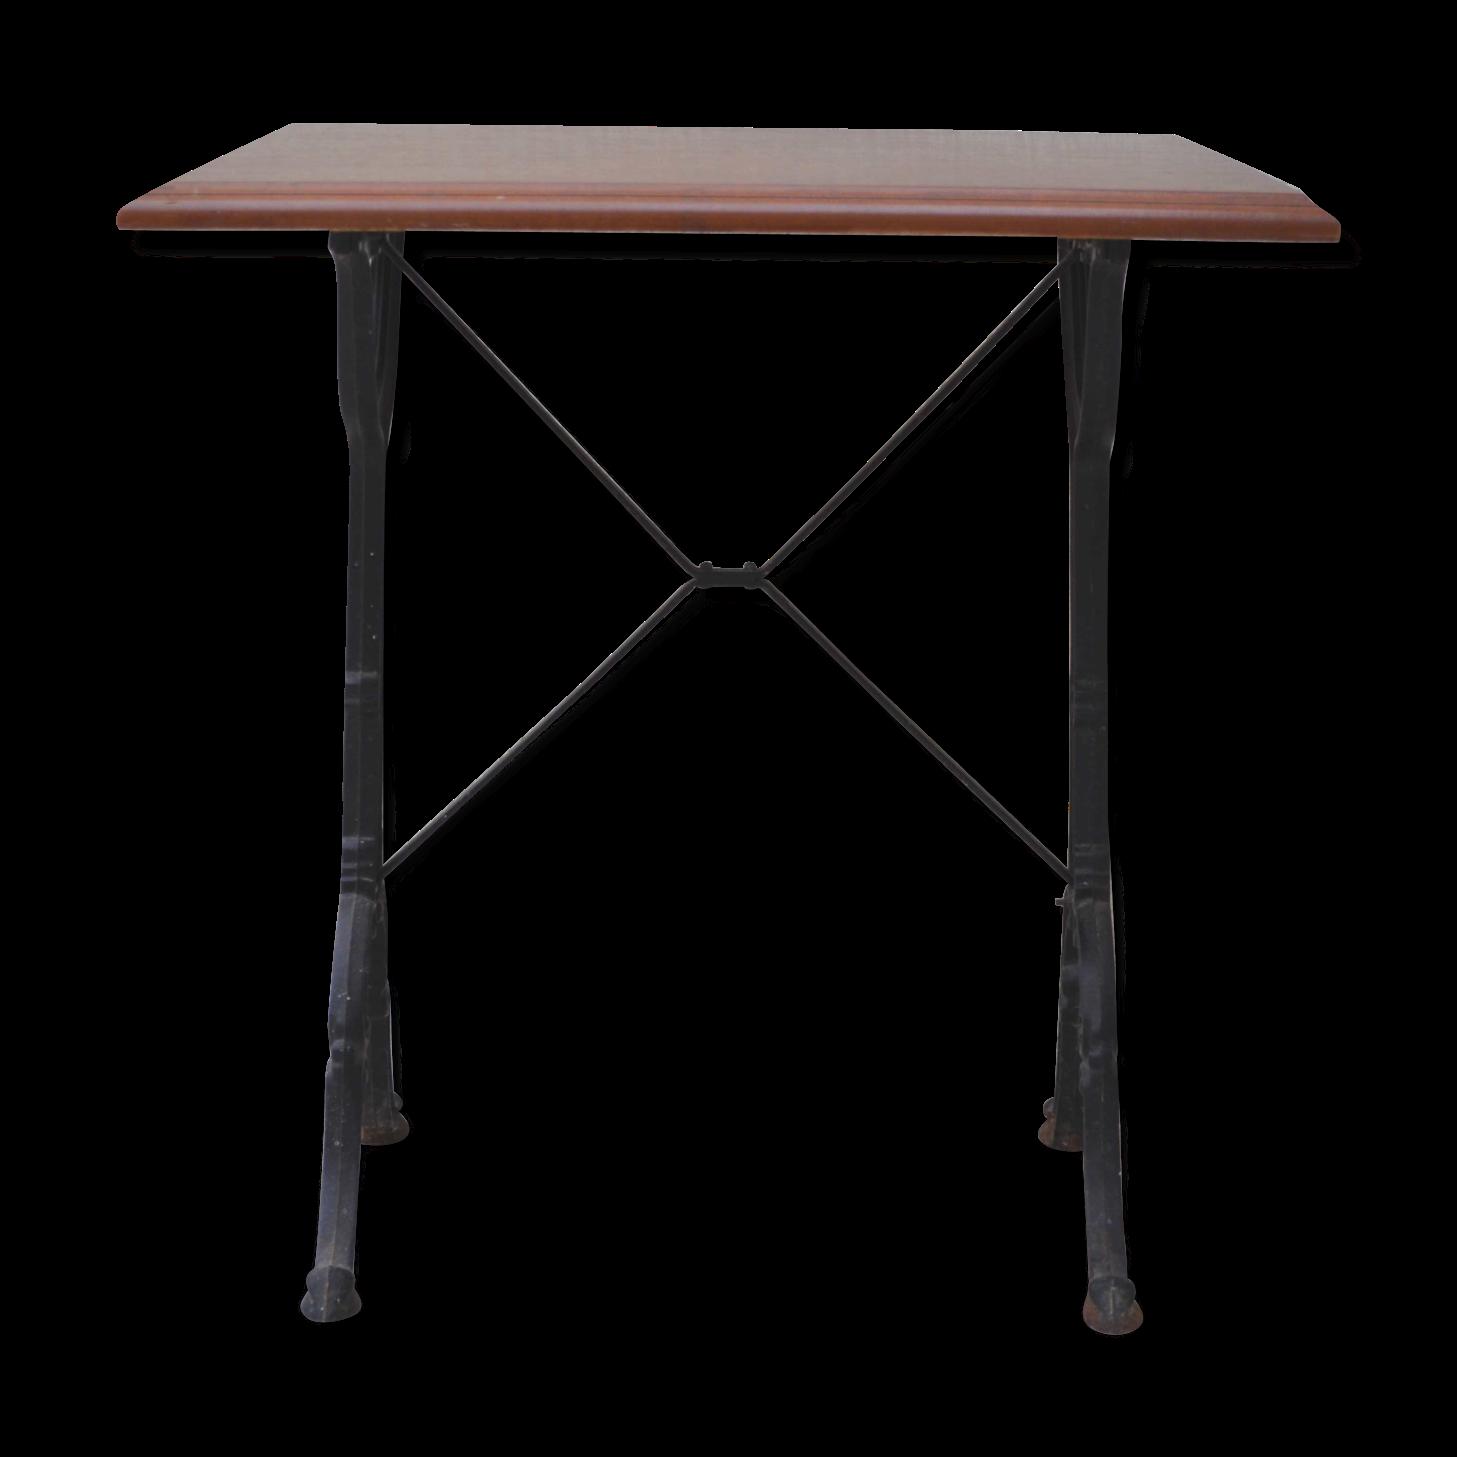 table bistrot carree excellent table pliante carr en teck ecograde bistrot x with table bistrot. Black Bedroom Furniture Sets. Home Design Ideas